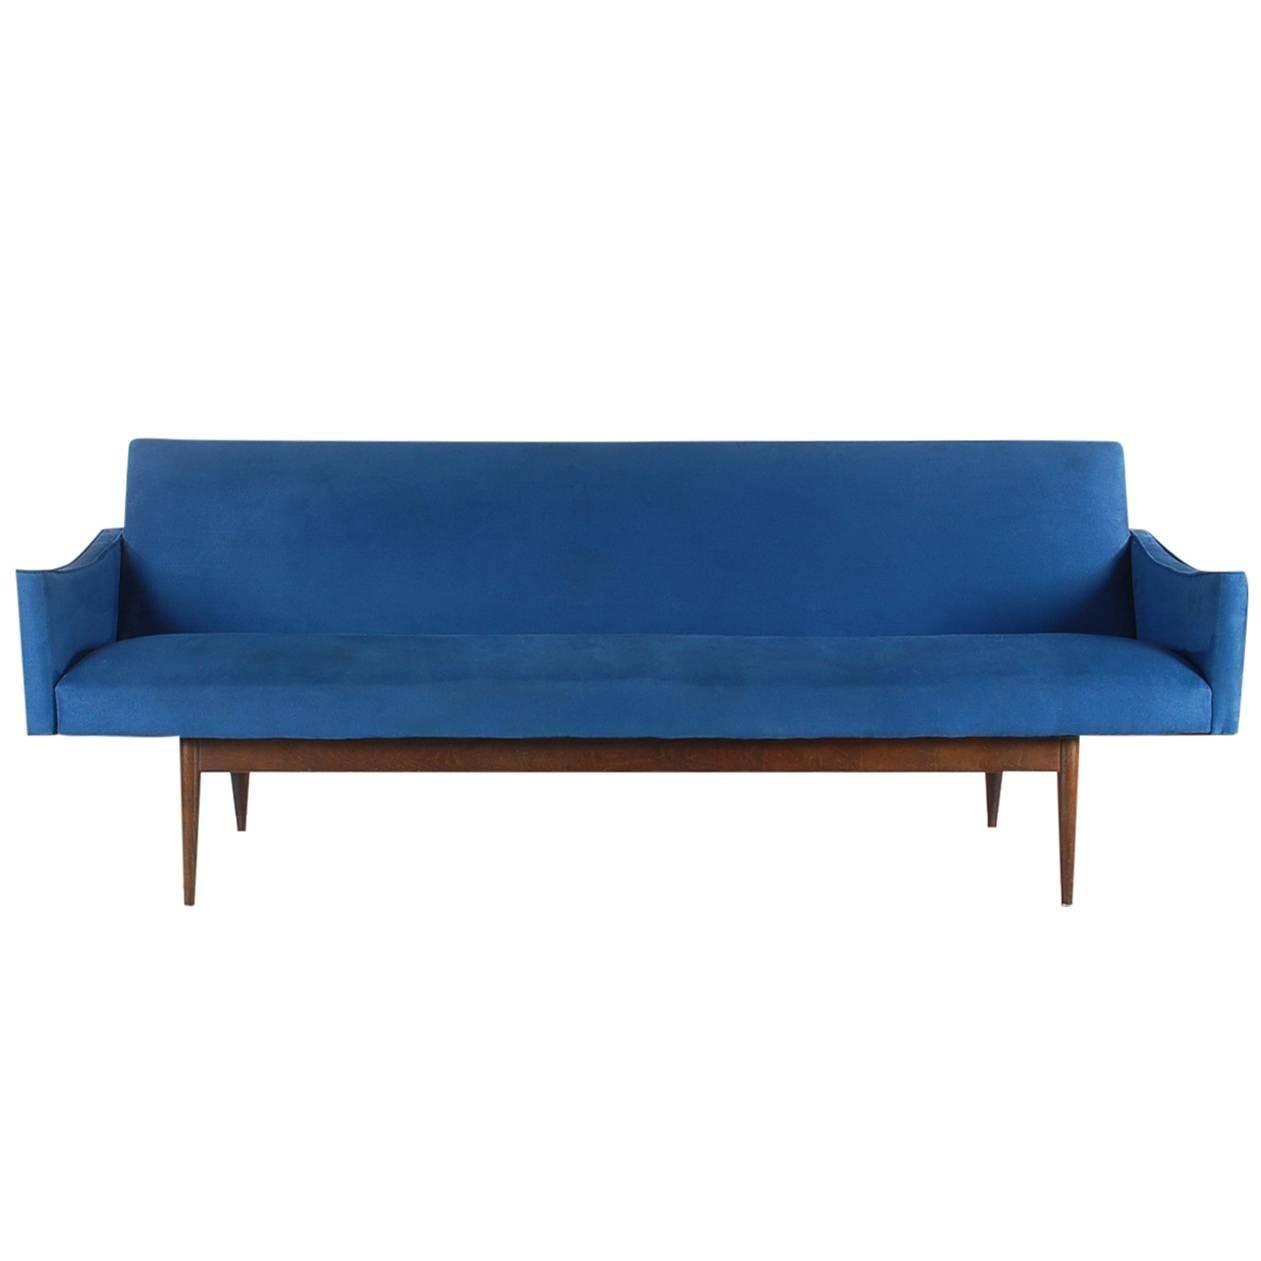 Mid-Century Italian Modern Sofa after Ico Parisi or Gio Ponti